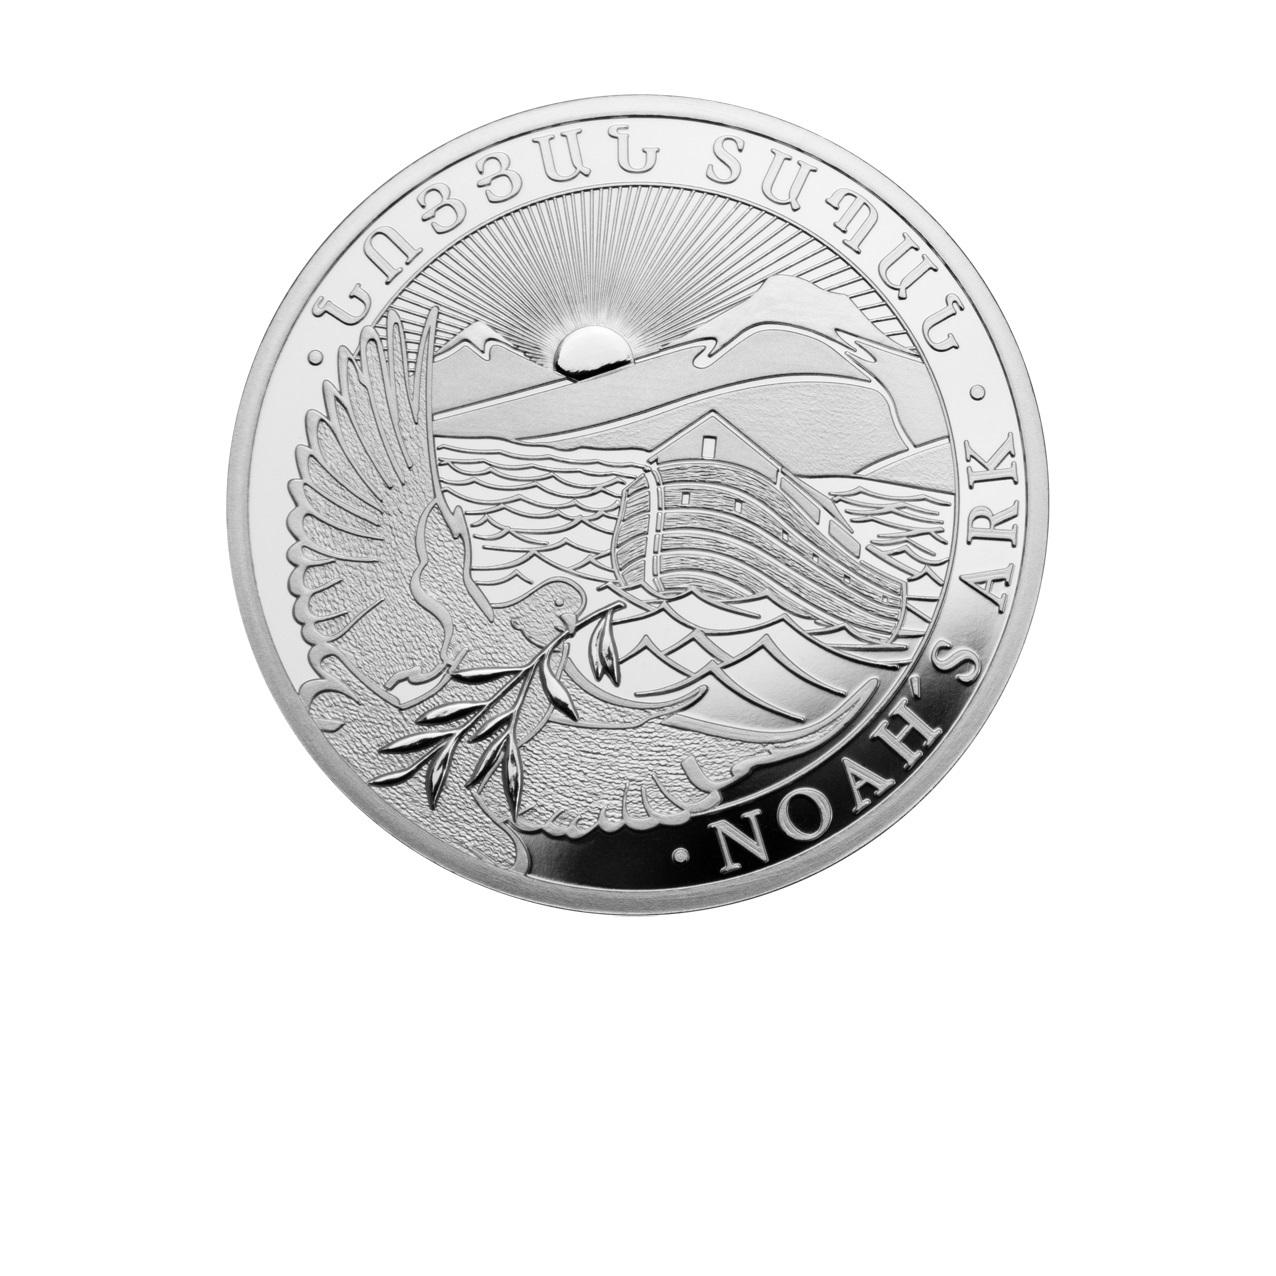 Stříbrná mince Noemova archa 1 oz